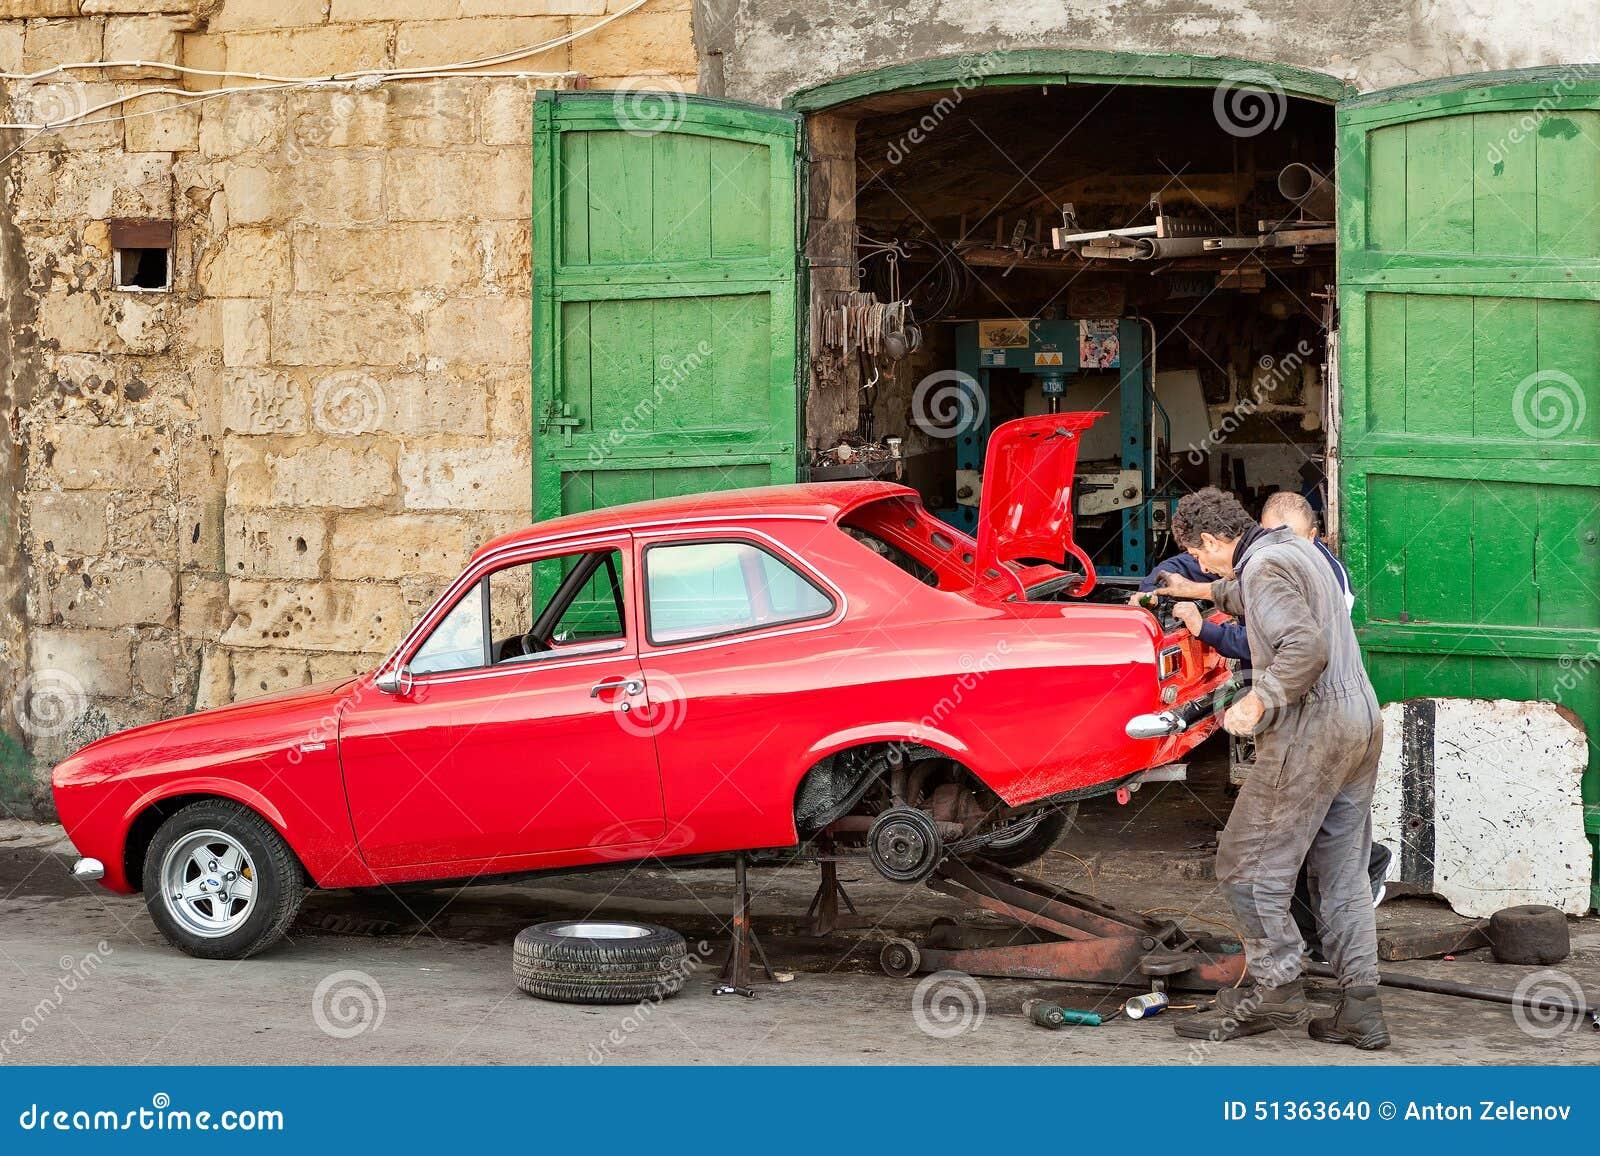 Lovely Restoring An Old Car Ideas - Classic Cars Ideas - boiq.info